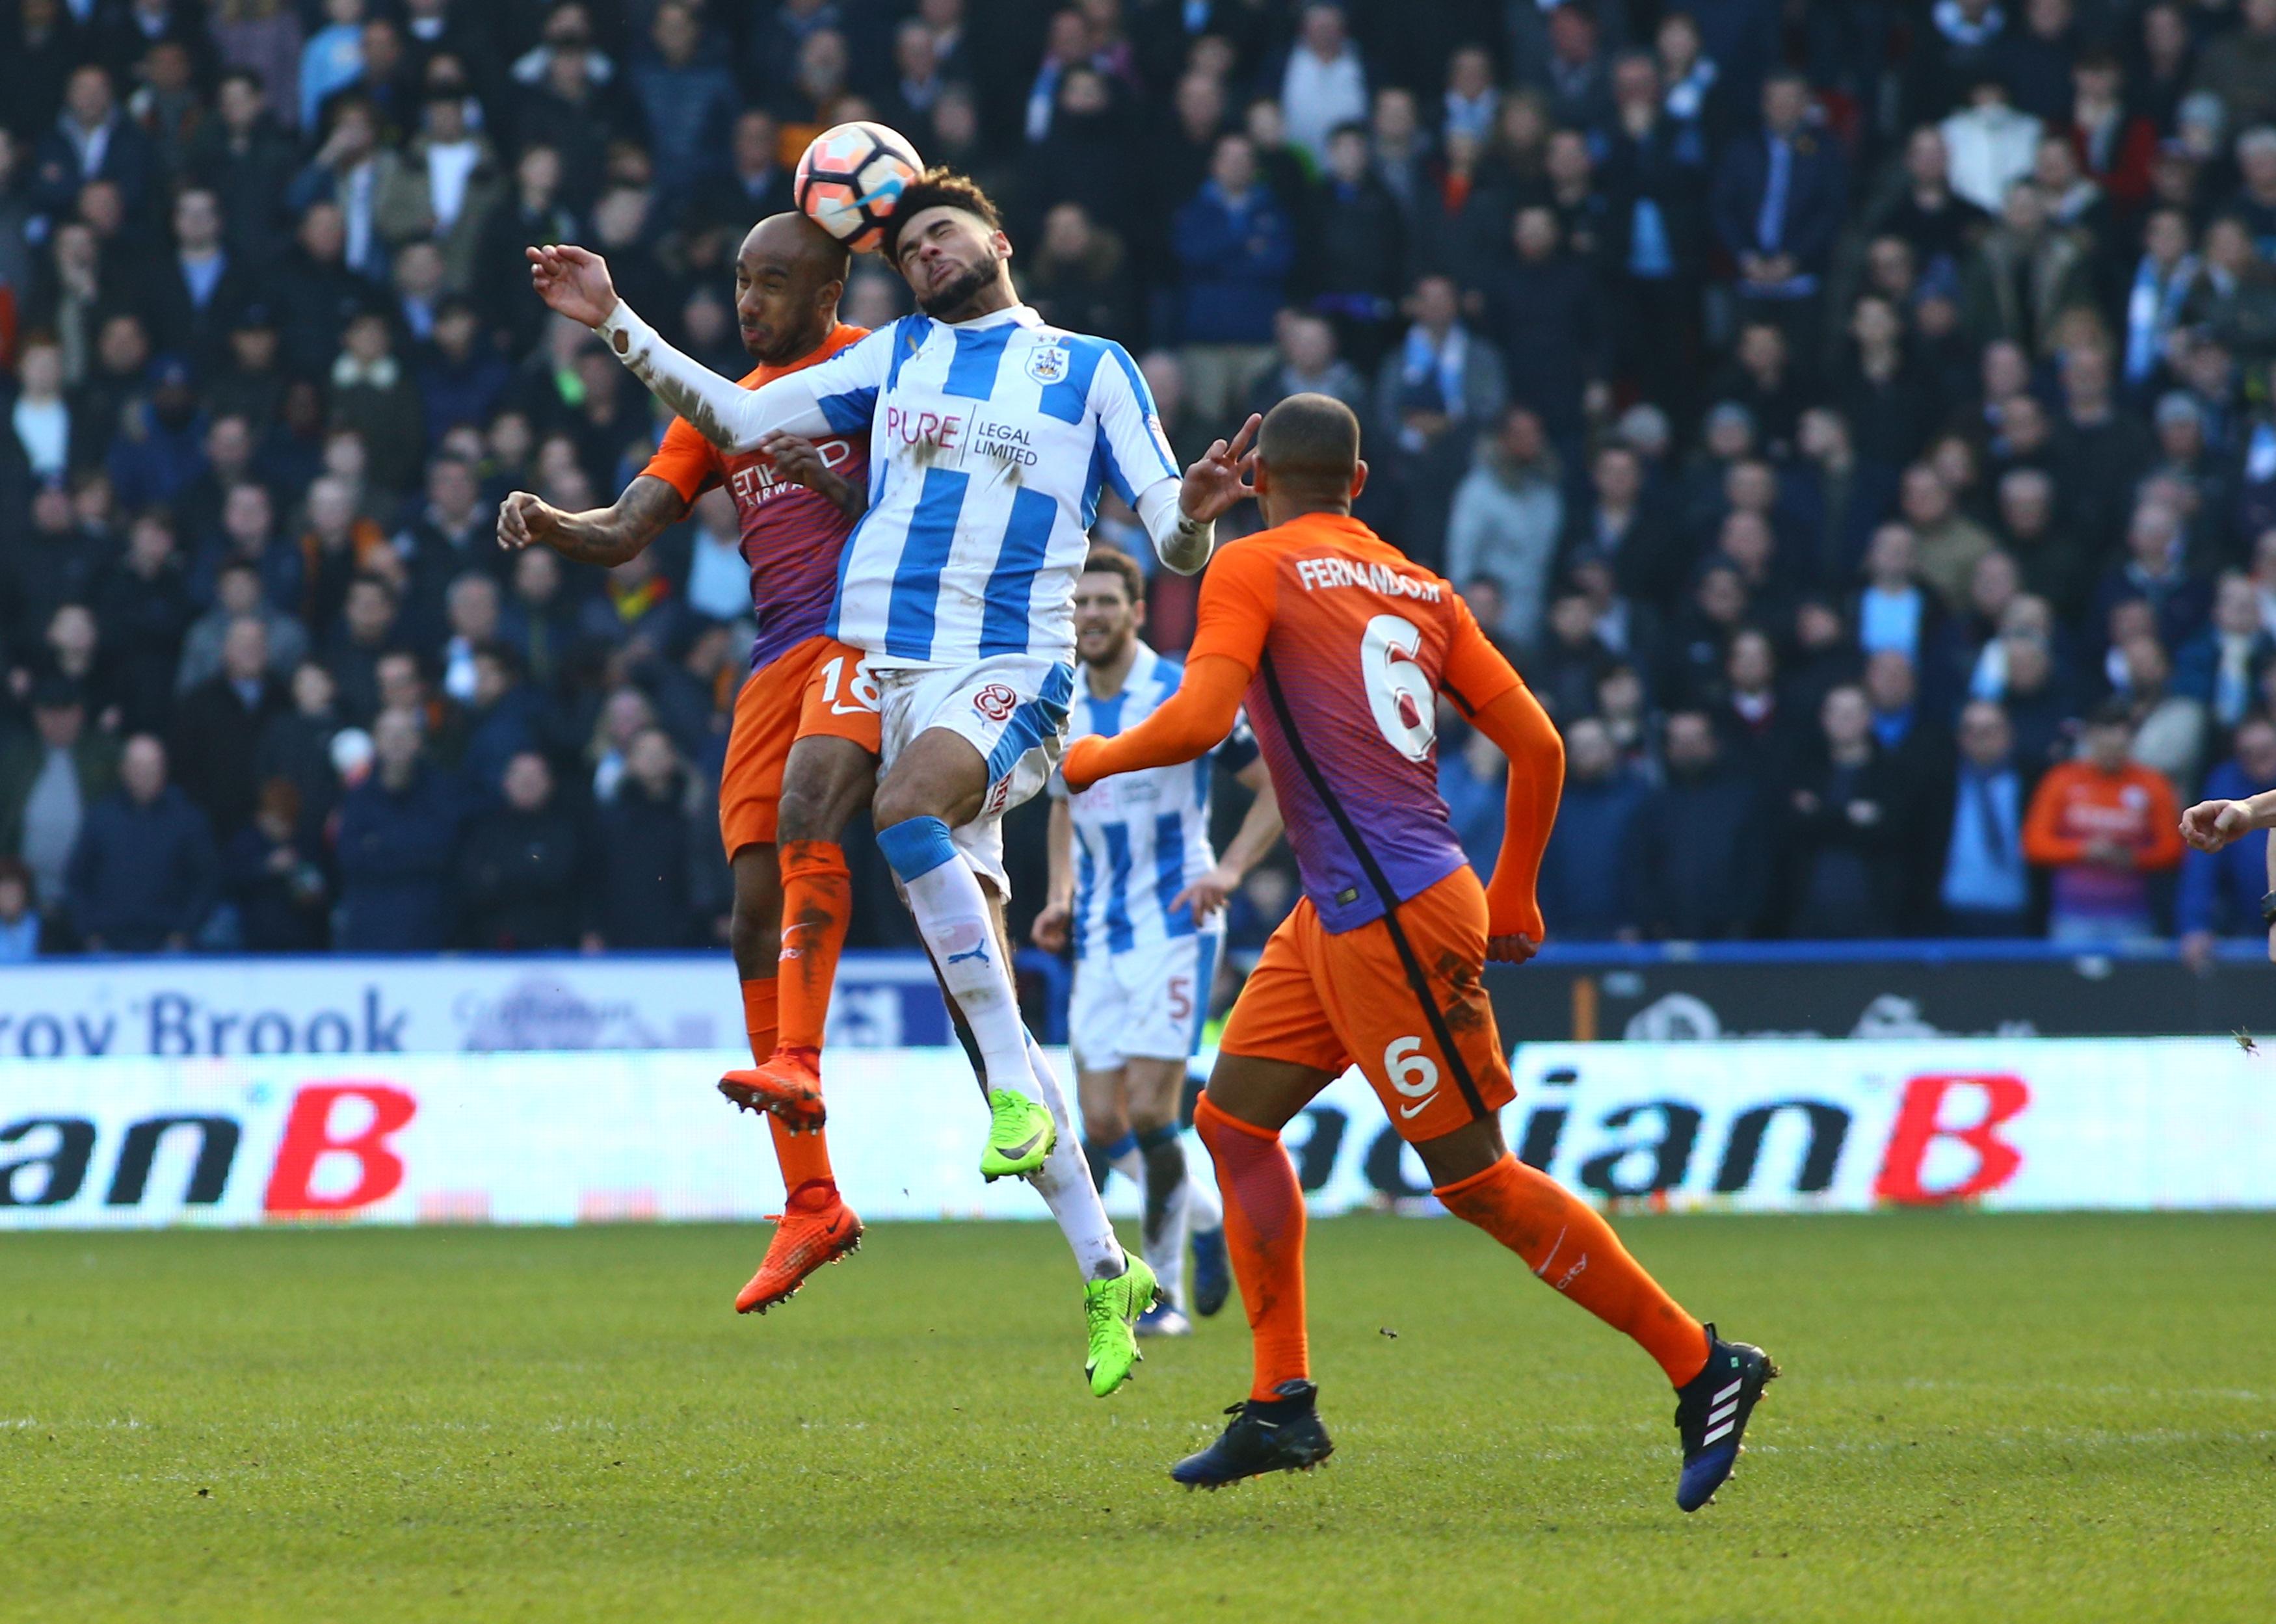 Pep Guardiola praises Claudio Bravo, Huddersfield's Joel Coleman after draw